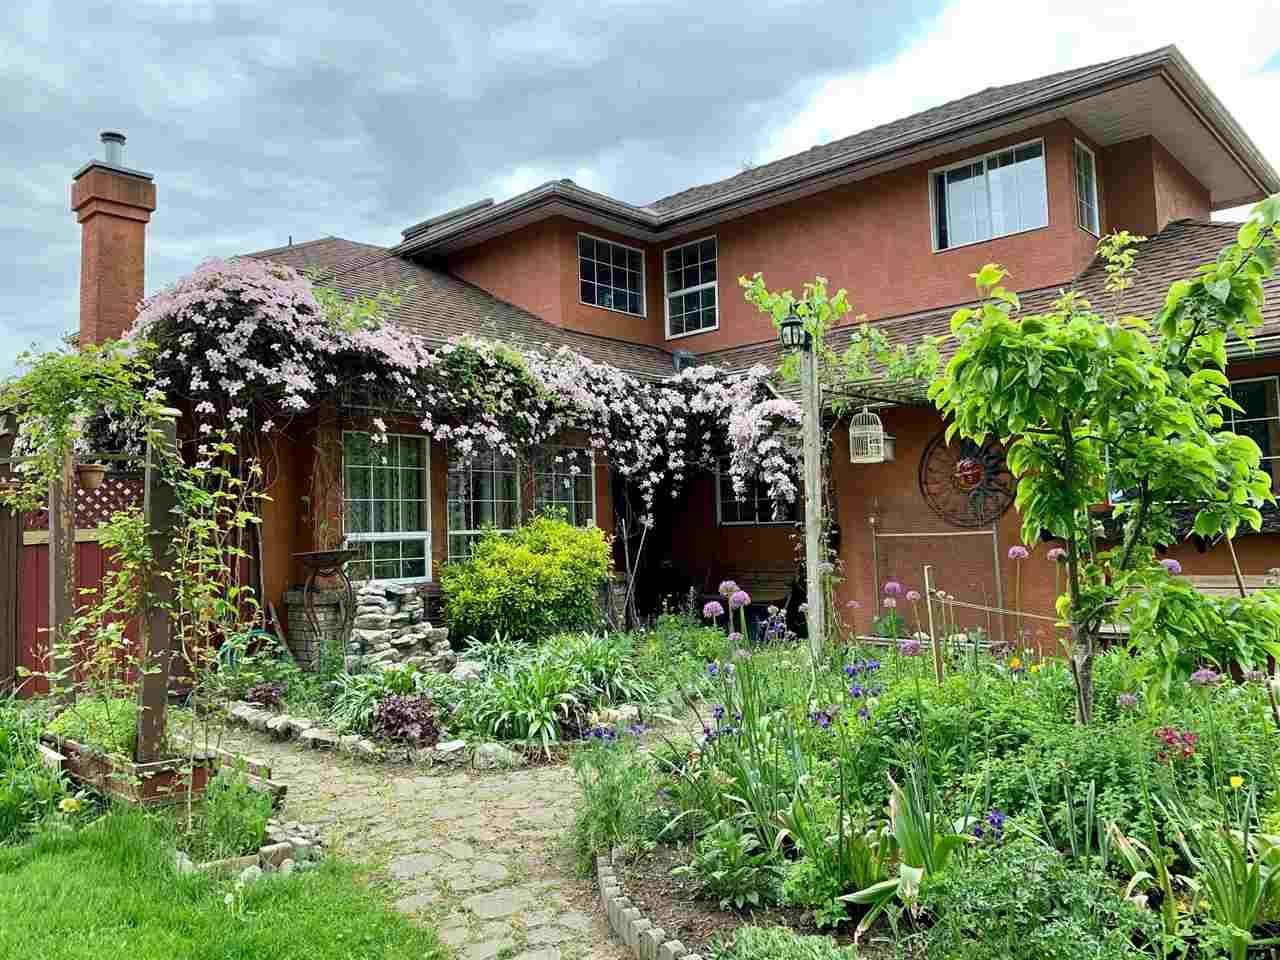 Main Photo: 5233 57 Street in Delta: Hawthorne House for sale (Ladner)  : MLS®# R2538553